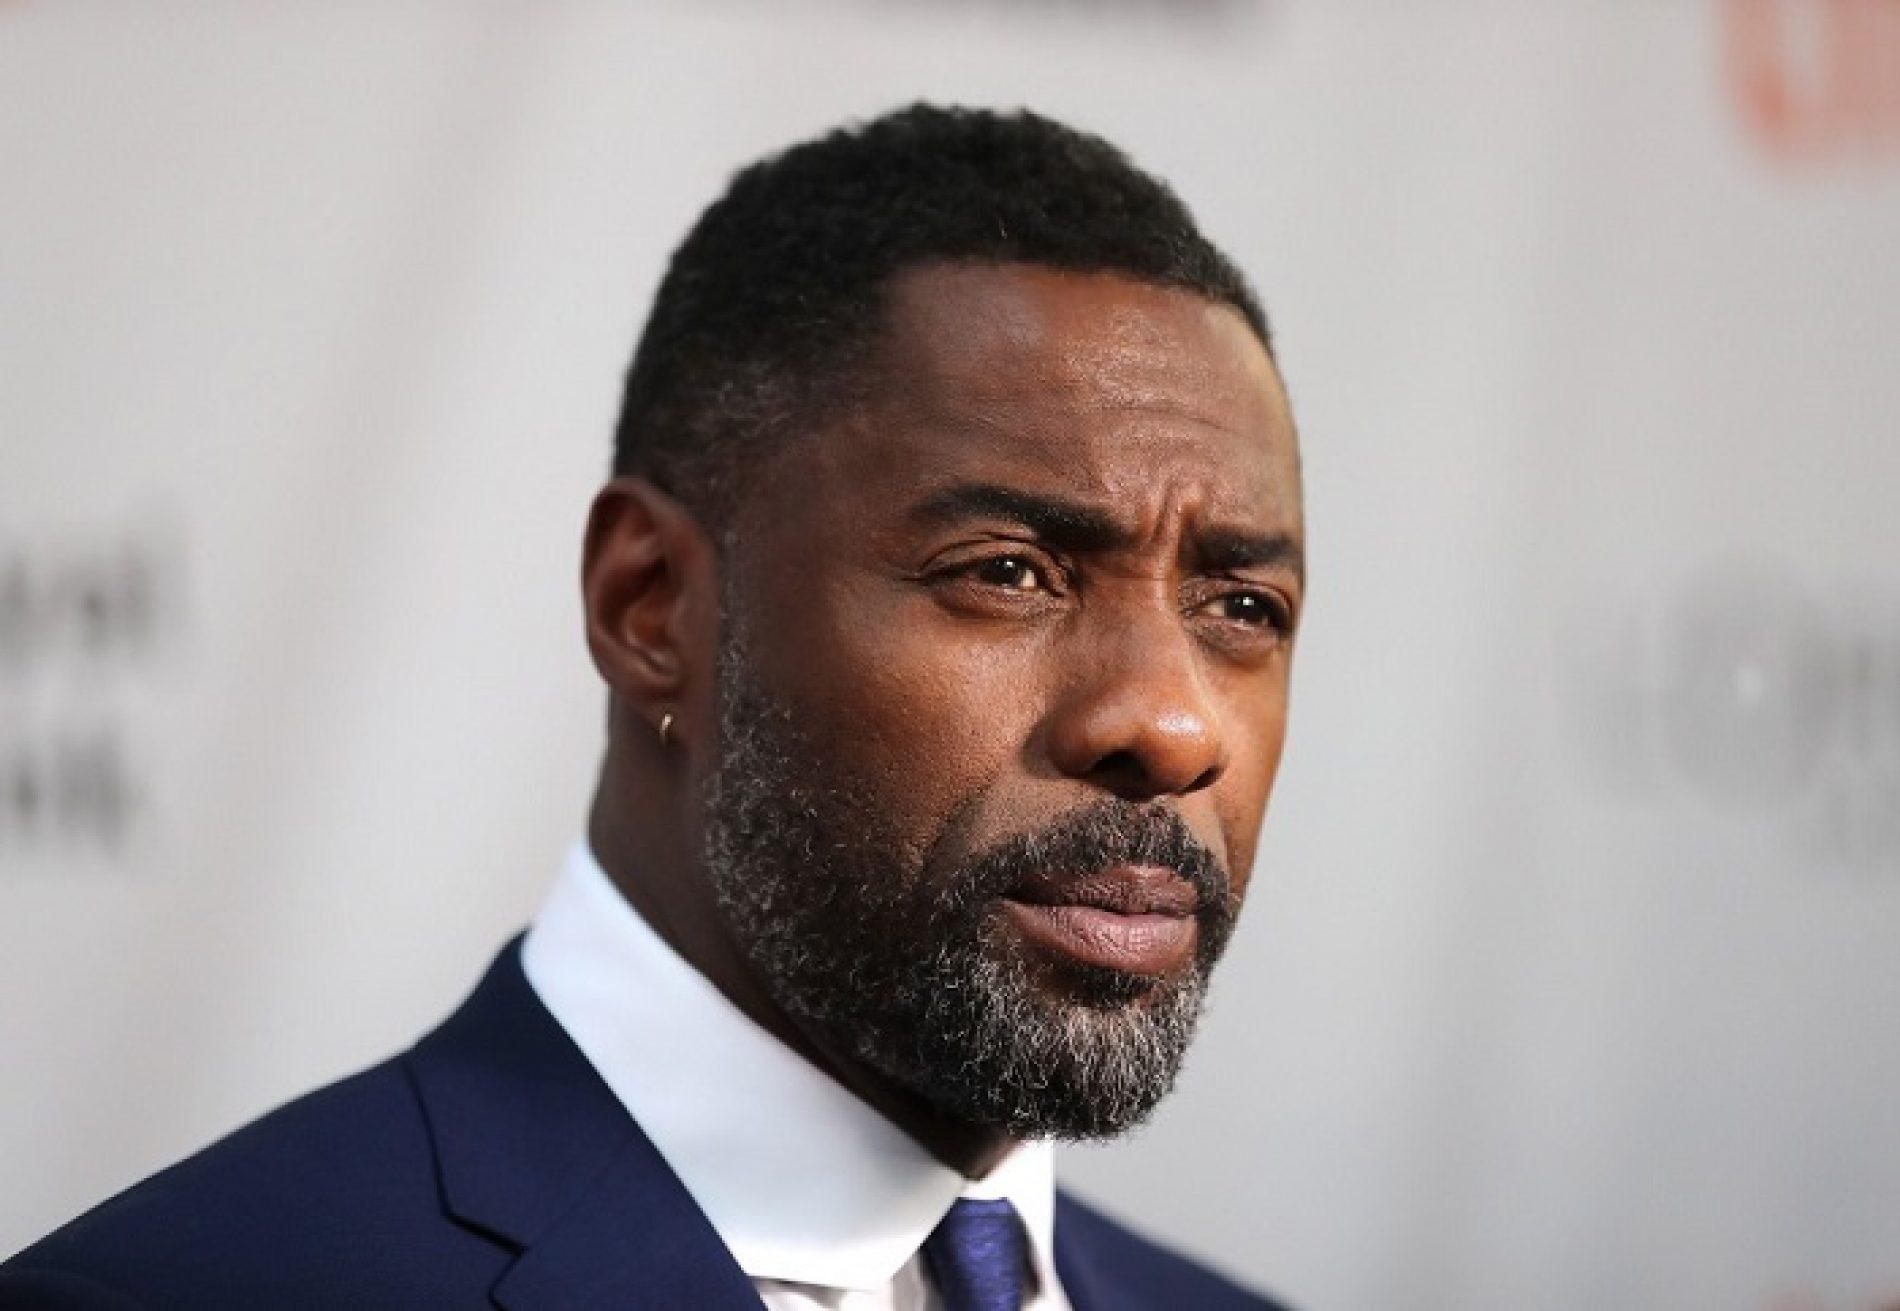 Idris Elba Is PEOPLE's Sexiest Man Alive 2018